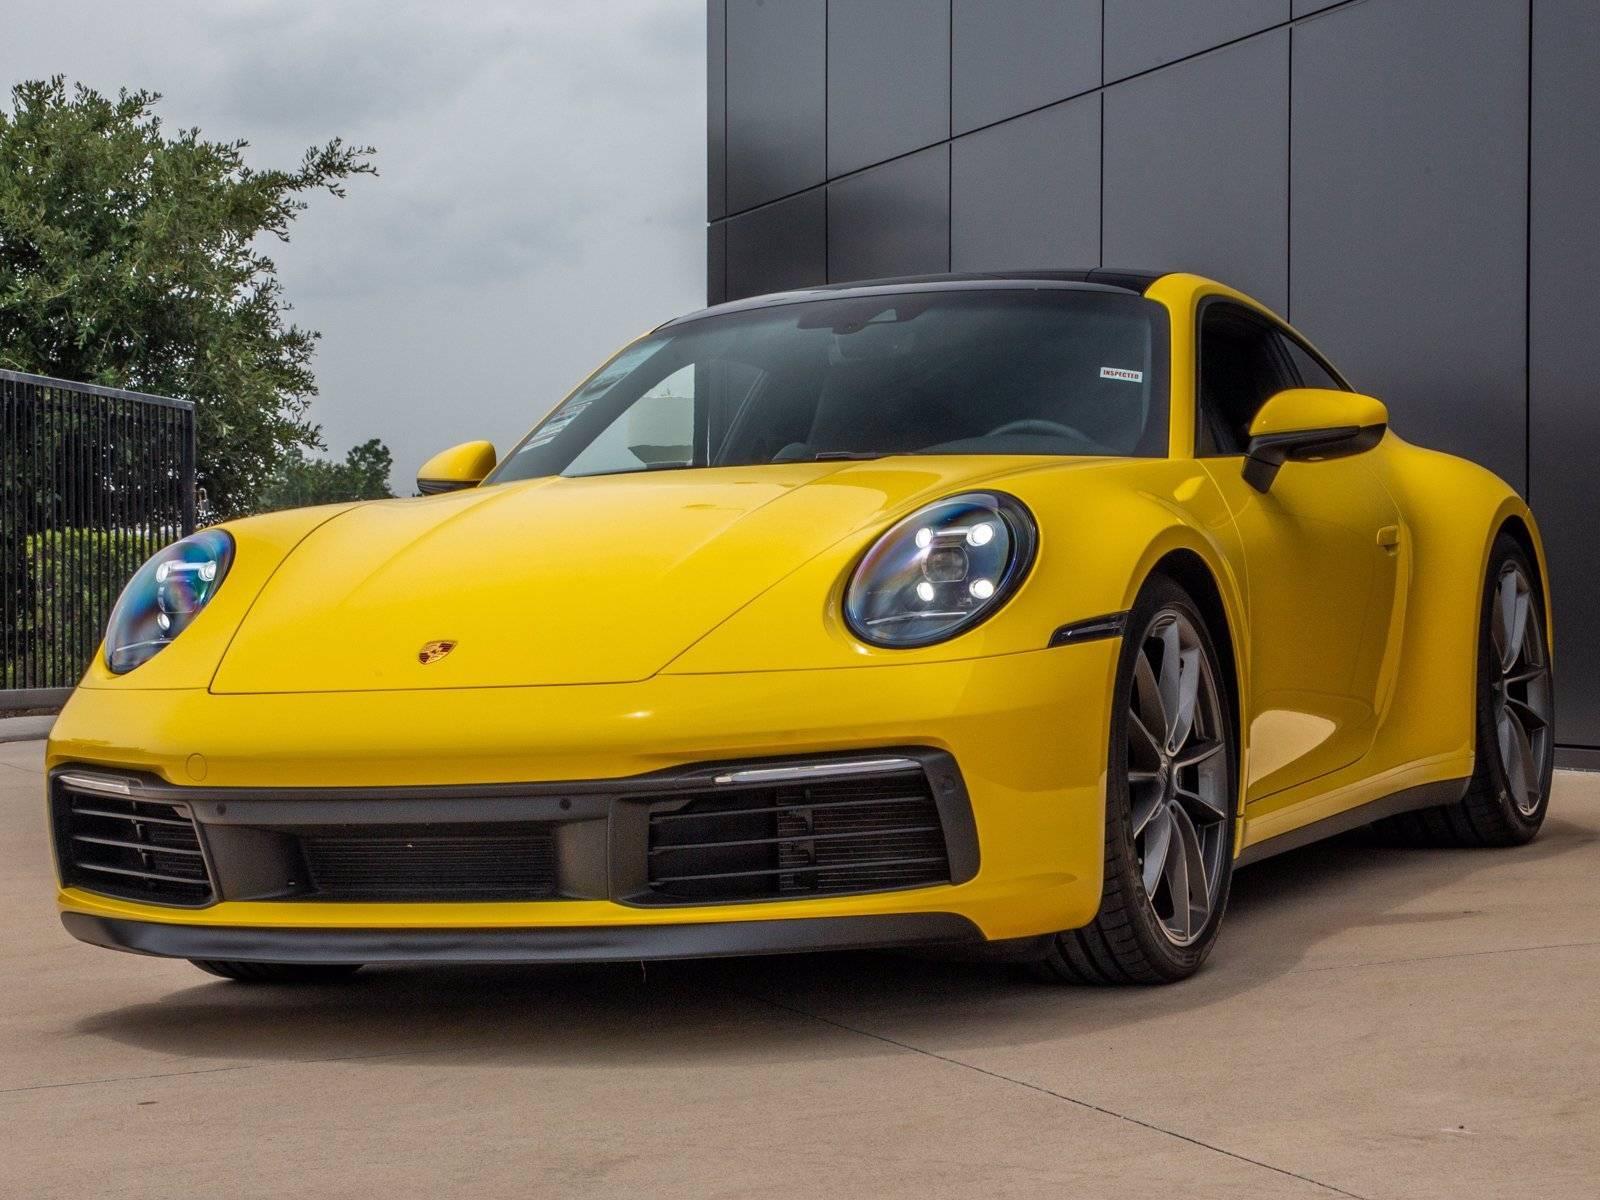 2020 Porsche 911 Carrera S (992) – 2